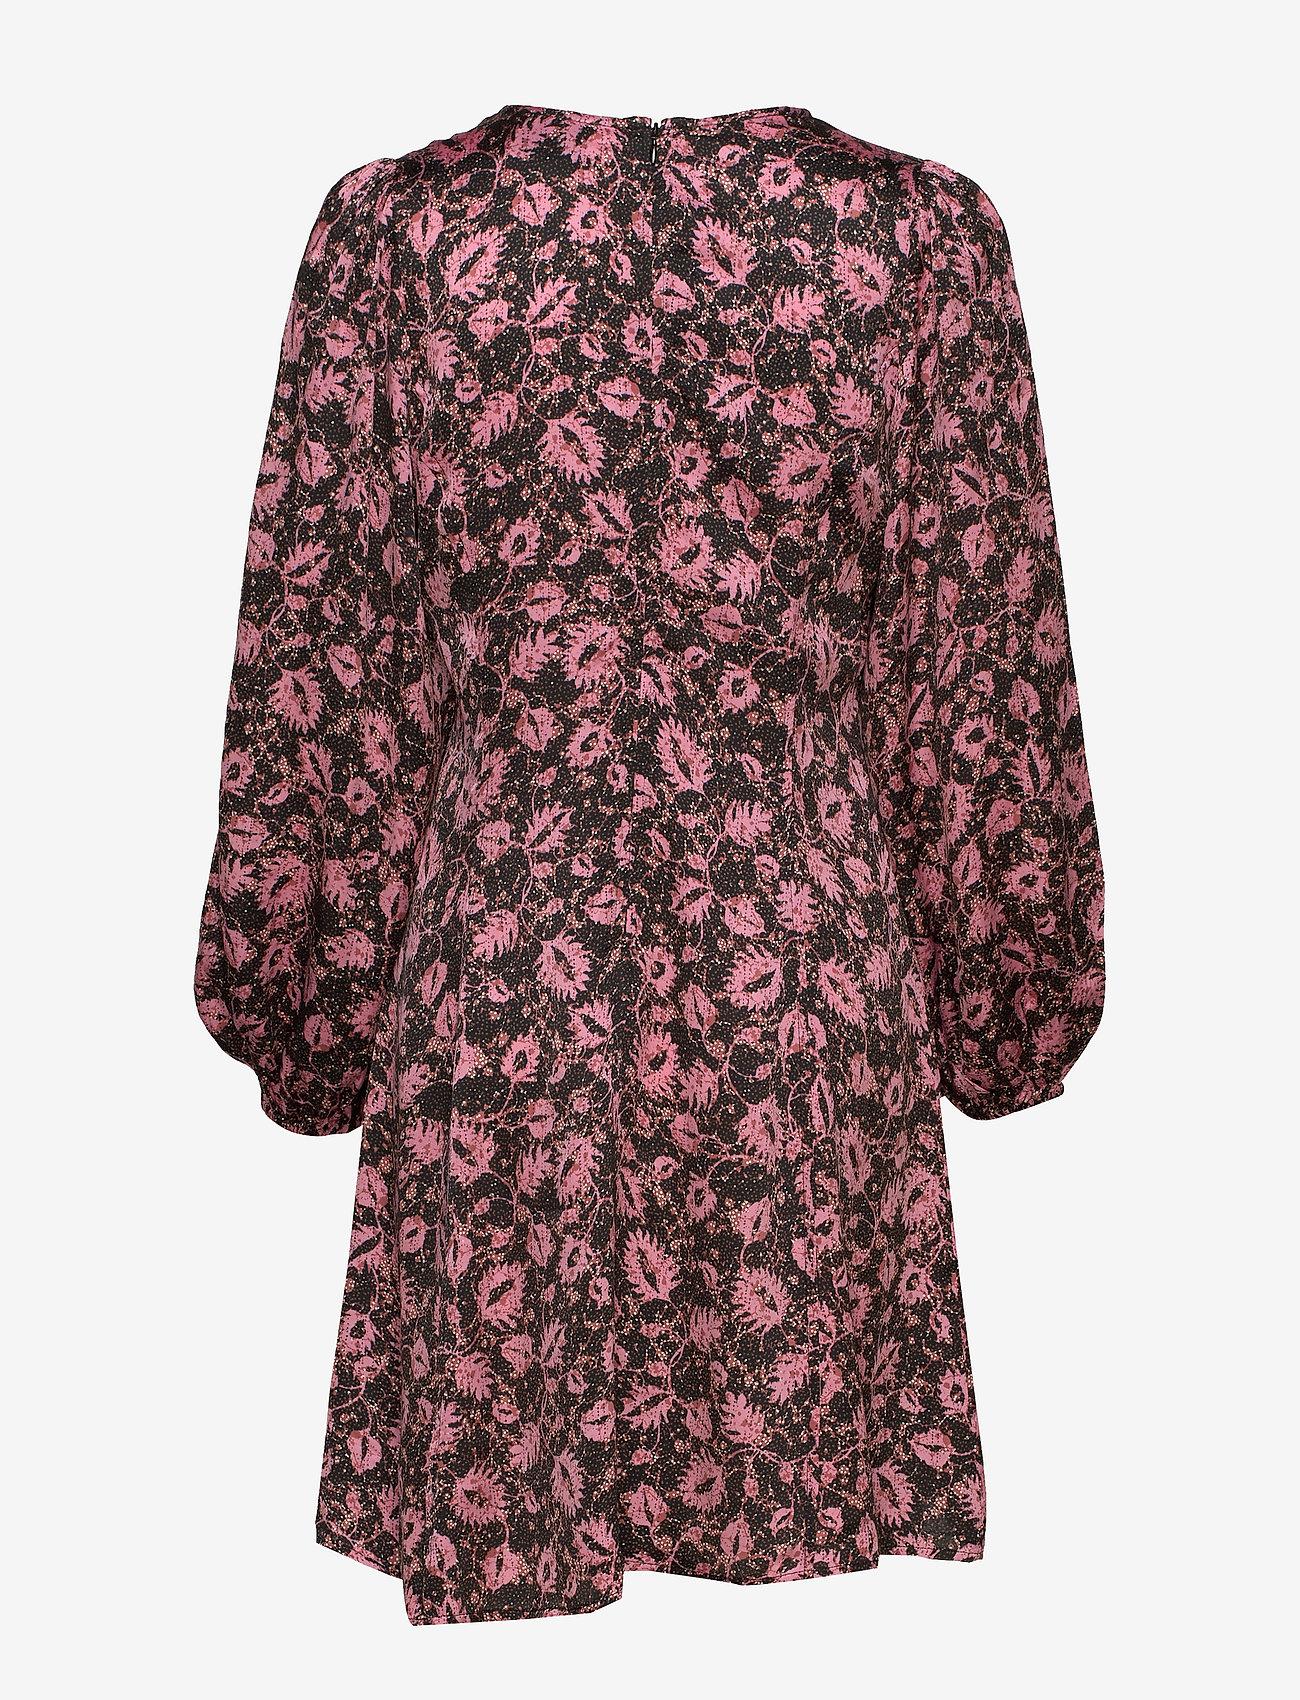 Neomito Ls Dress (Black Beauty) (674.25 kr) - Second Female 8AH7Q3Nc